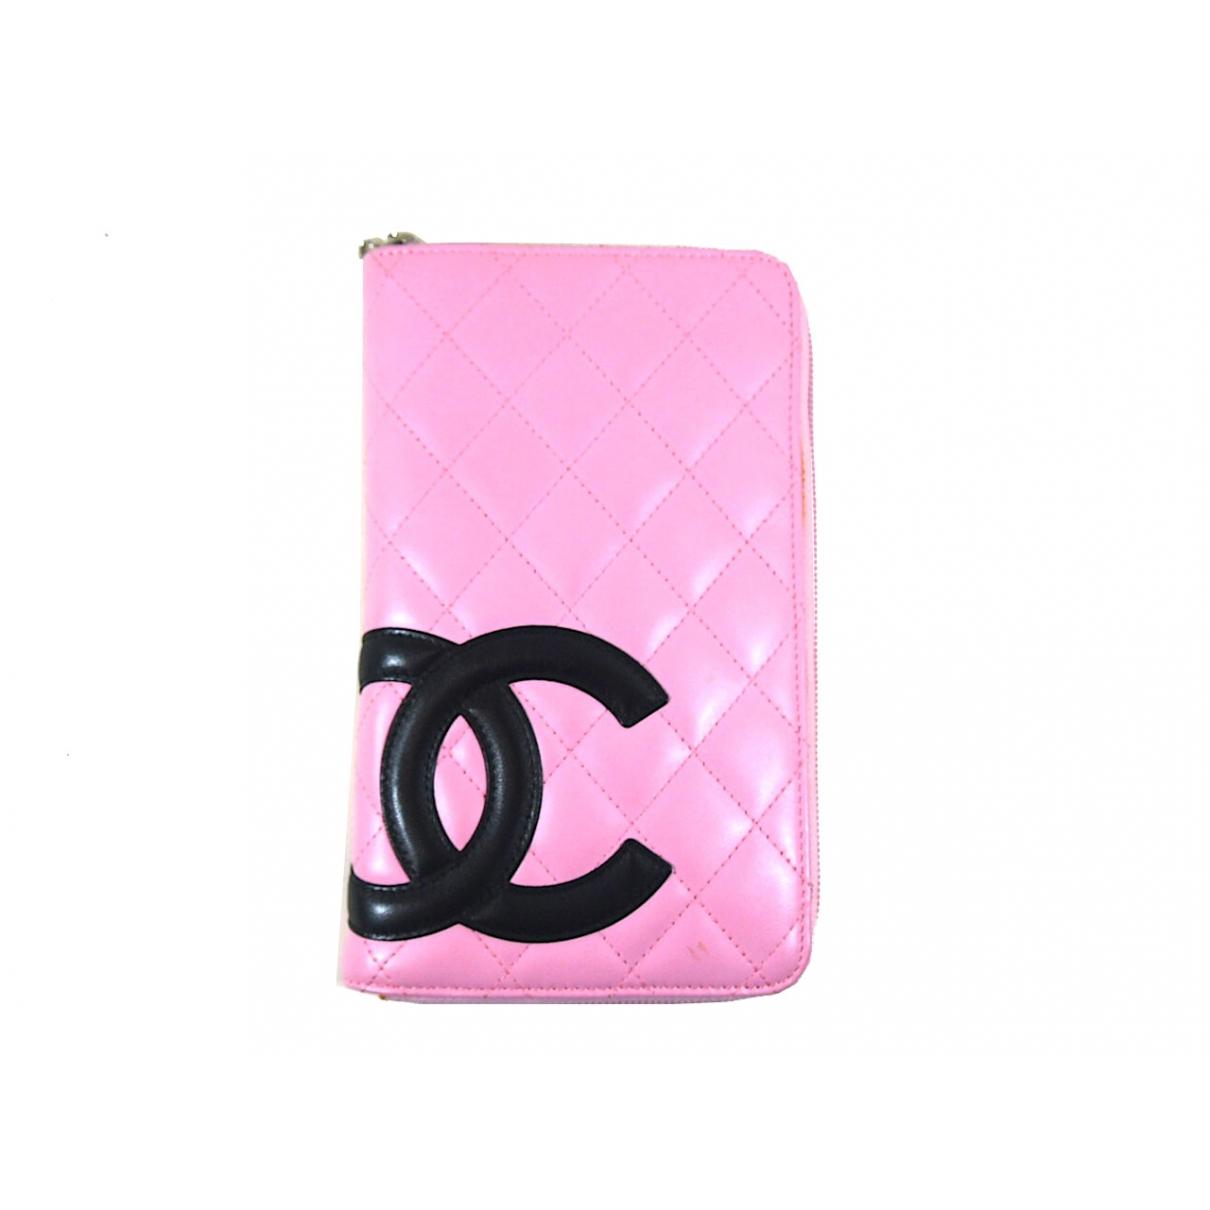 Chanel Cambon Portemonnaie in  Rosa Leder